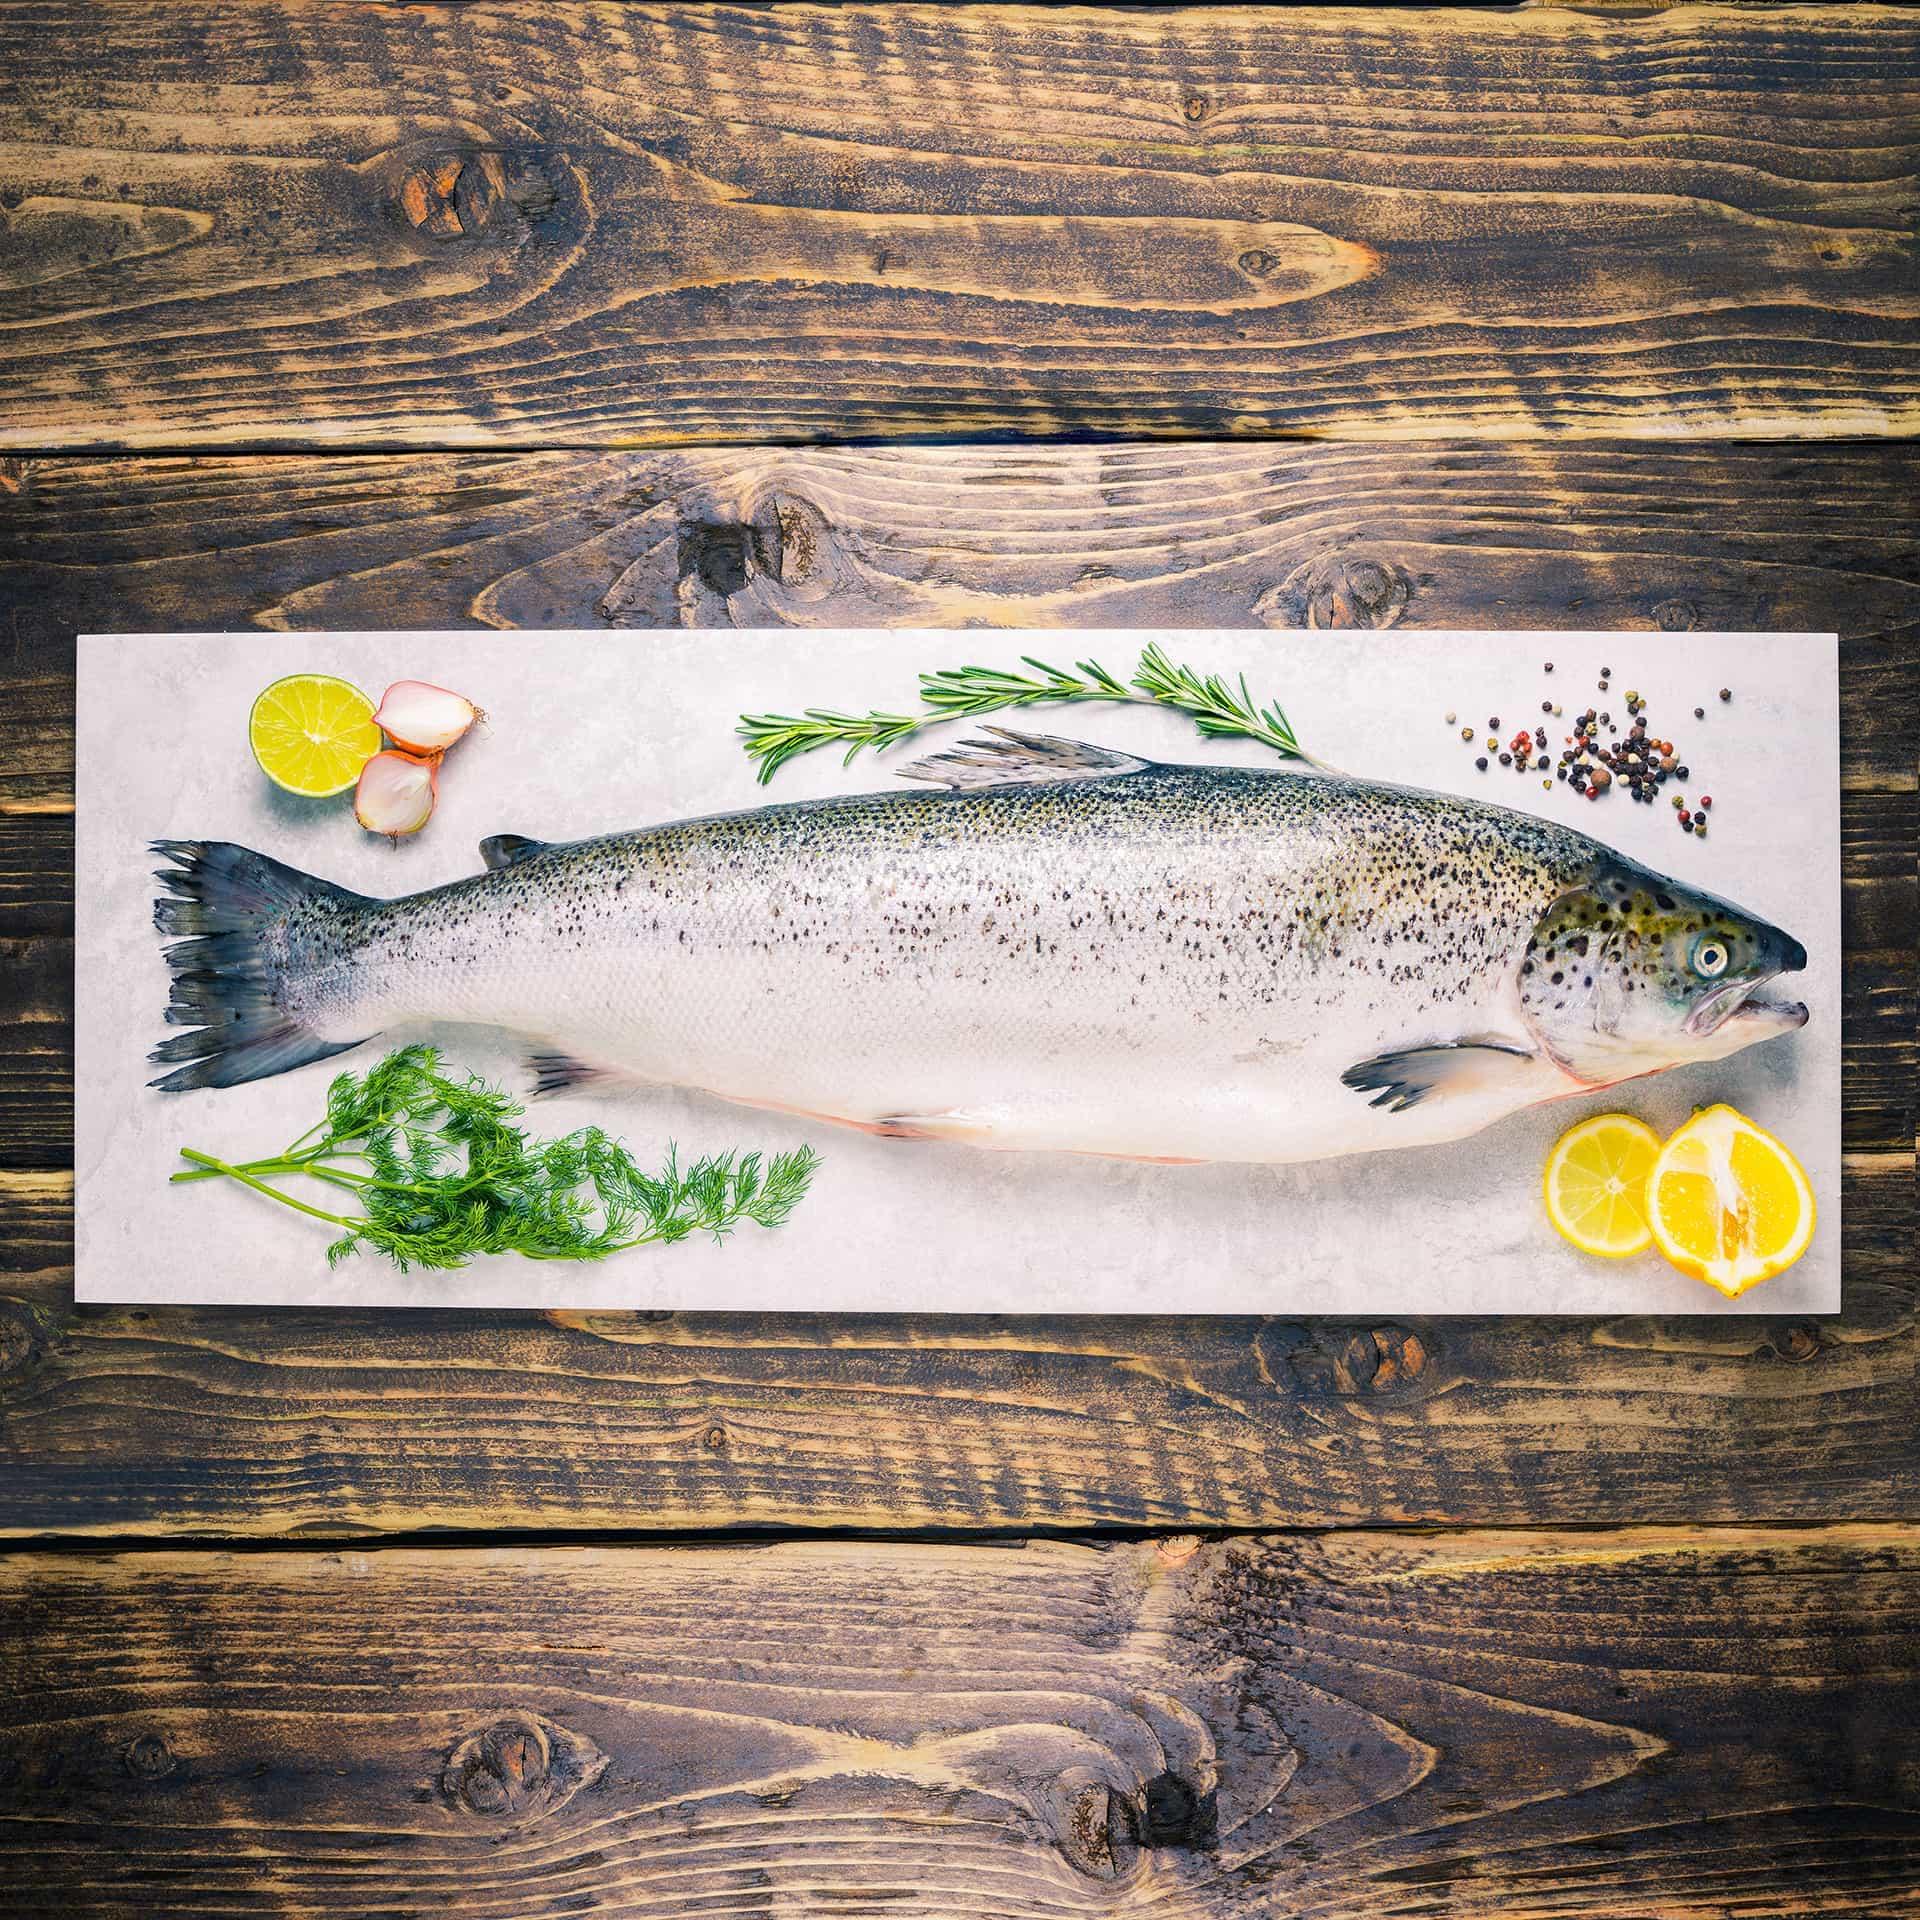 Whole salmon on a stone background